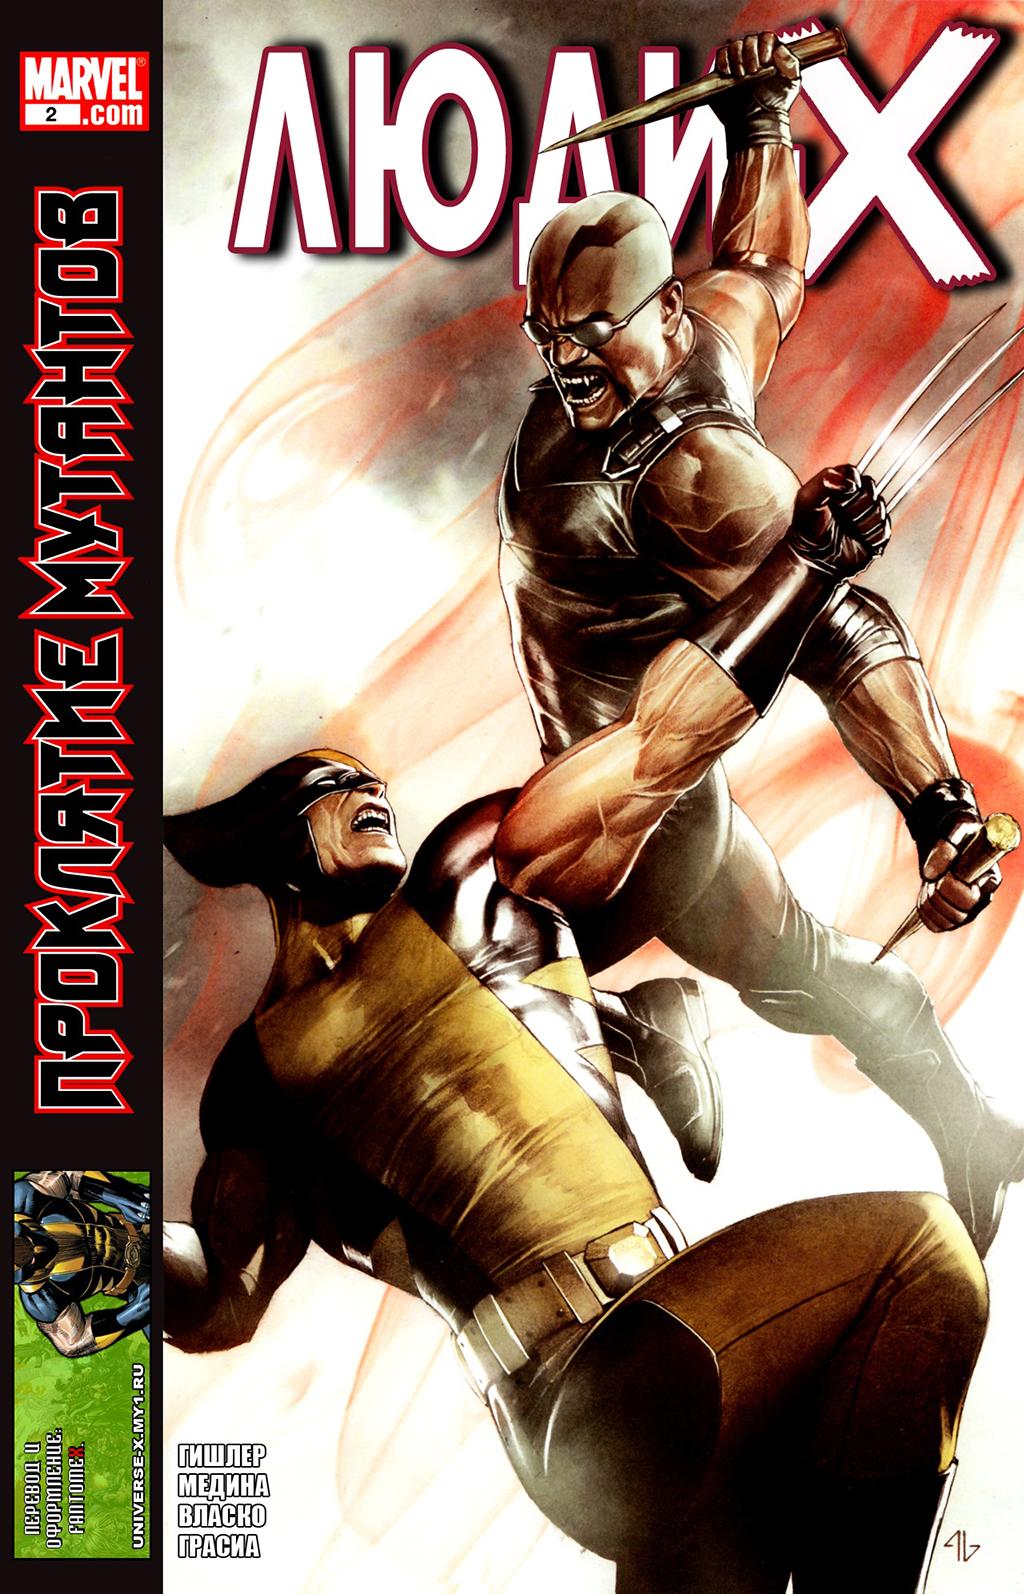 Комикс Люди Икс том 3